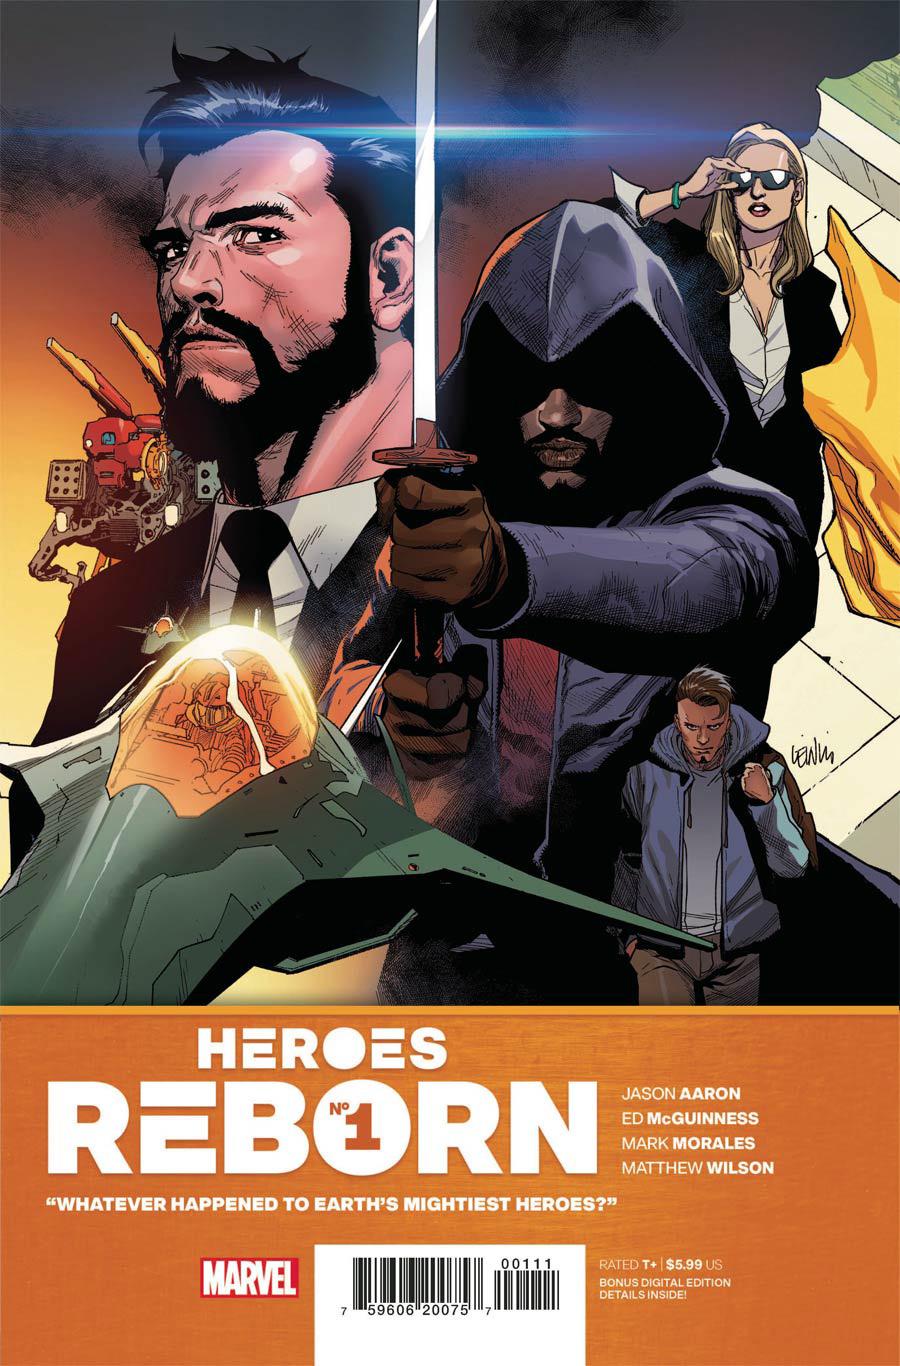 Heroes Reborn #1 Cover A Regular Leinil Francis Yu Cover